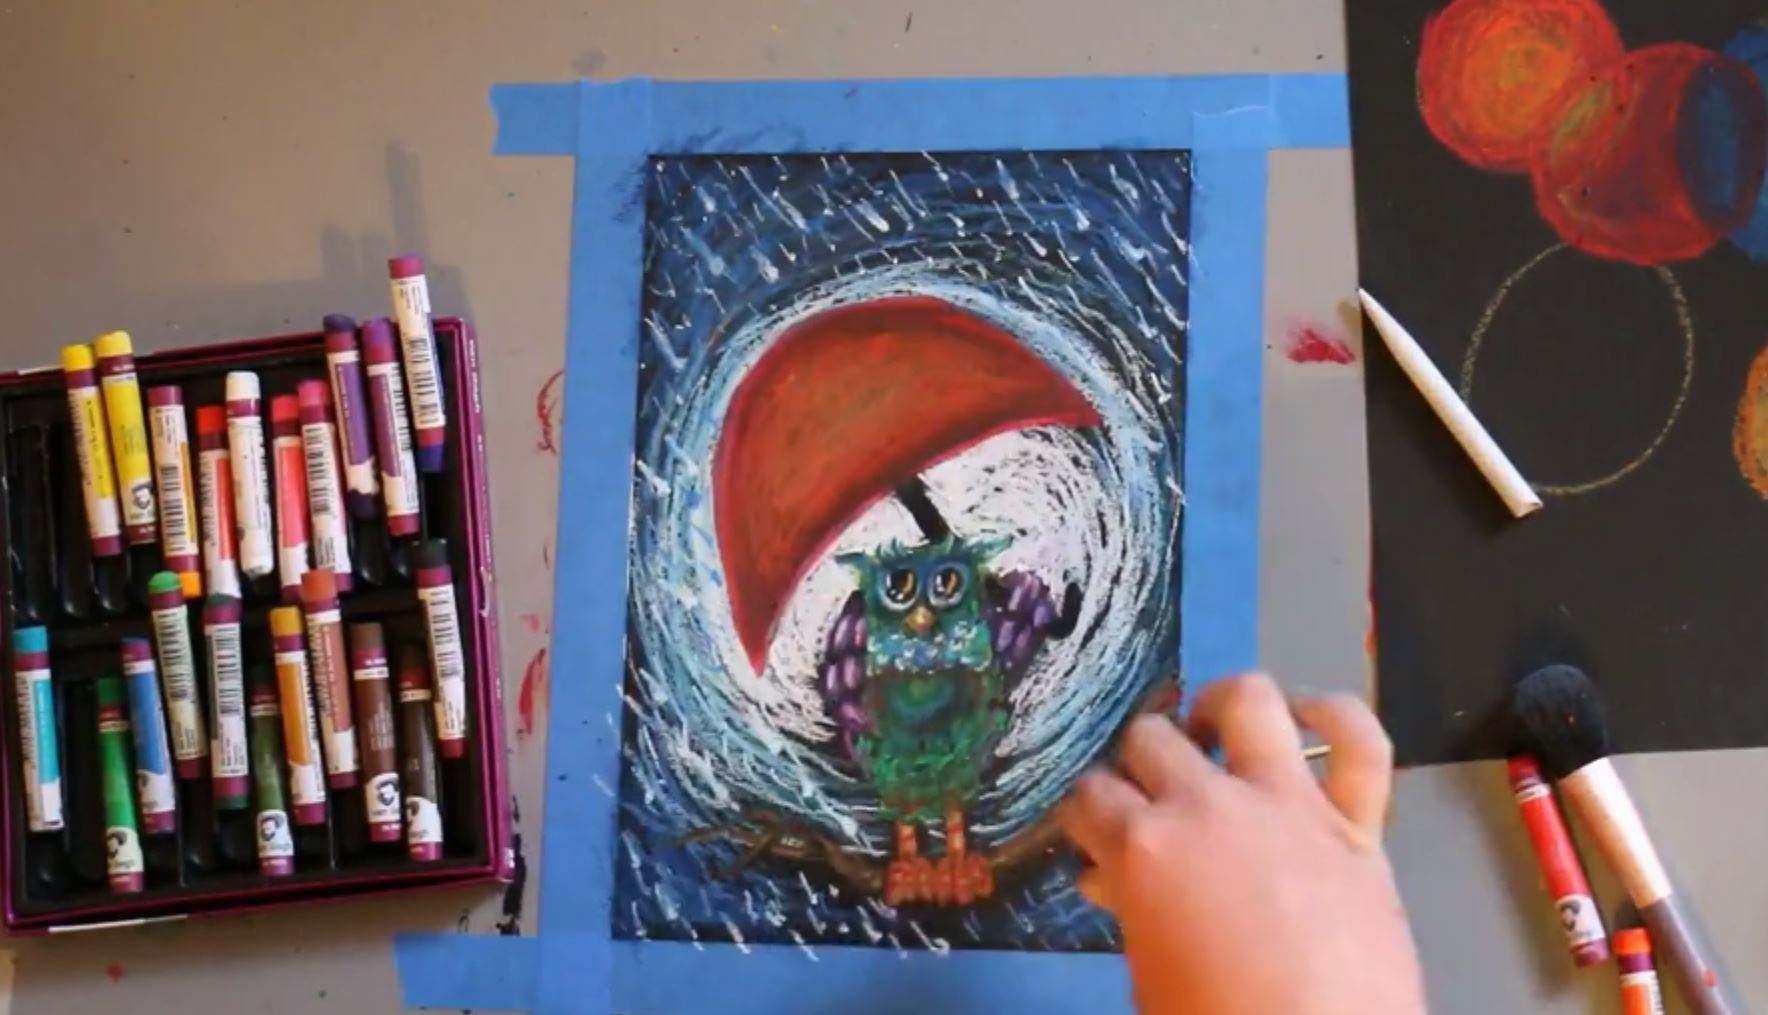 Pastel Techniques Workshop Strathmore Artist Papers